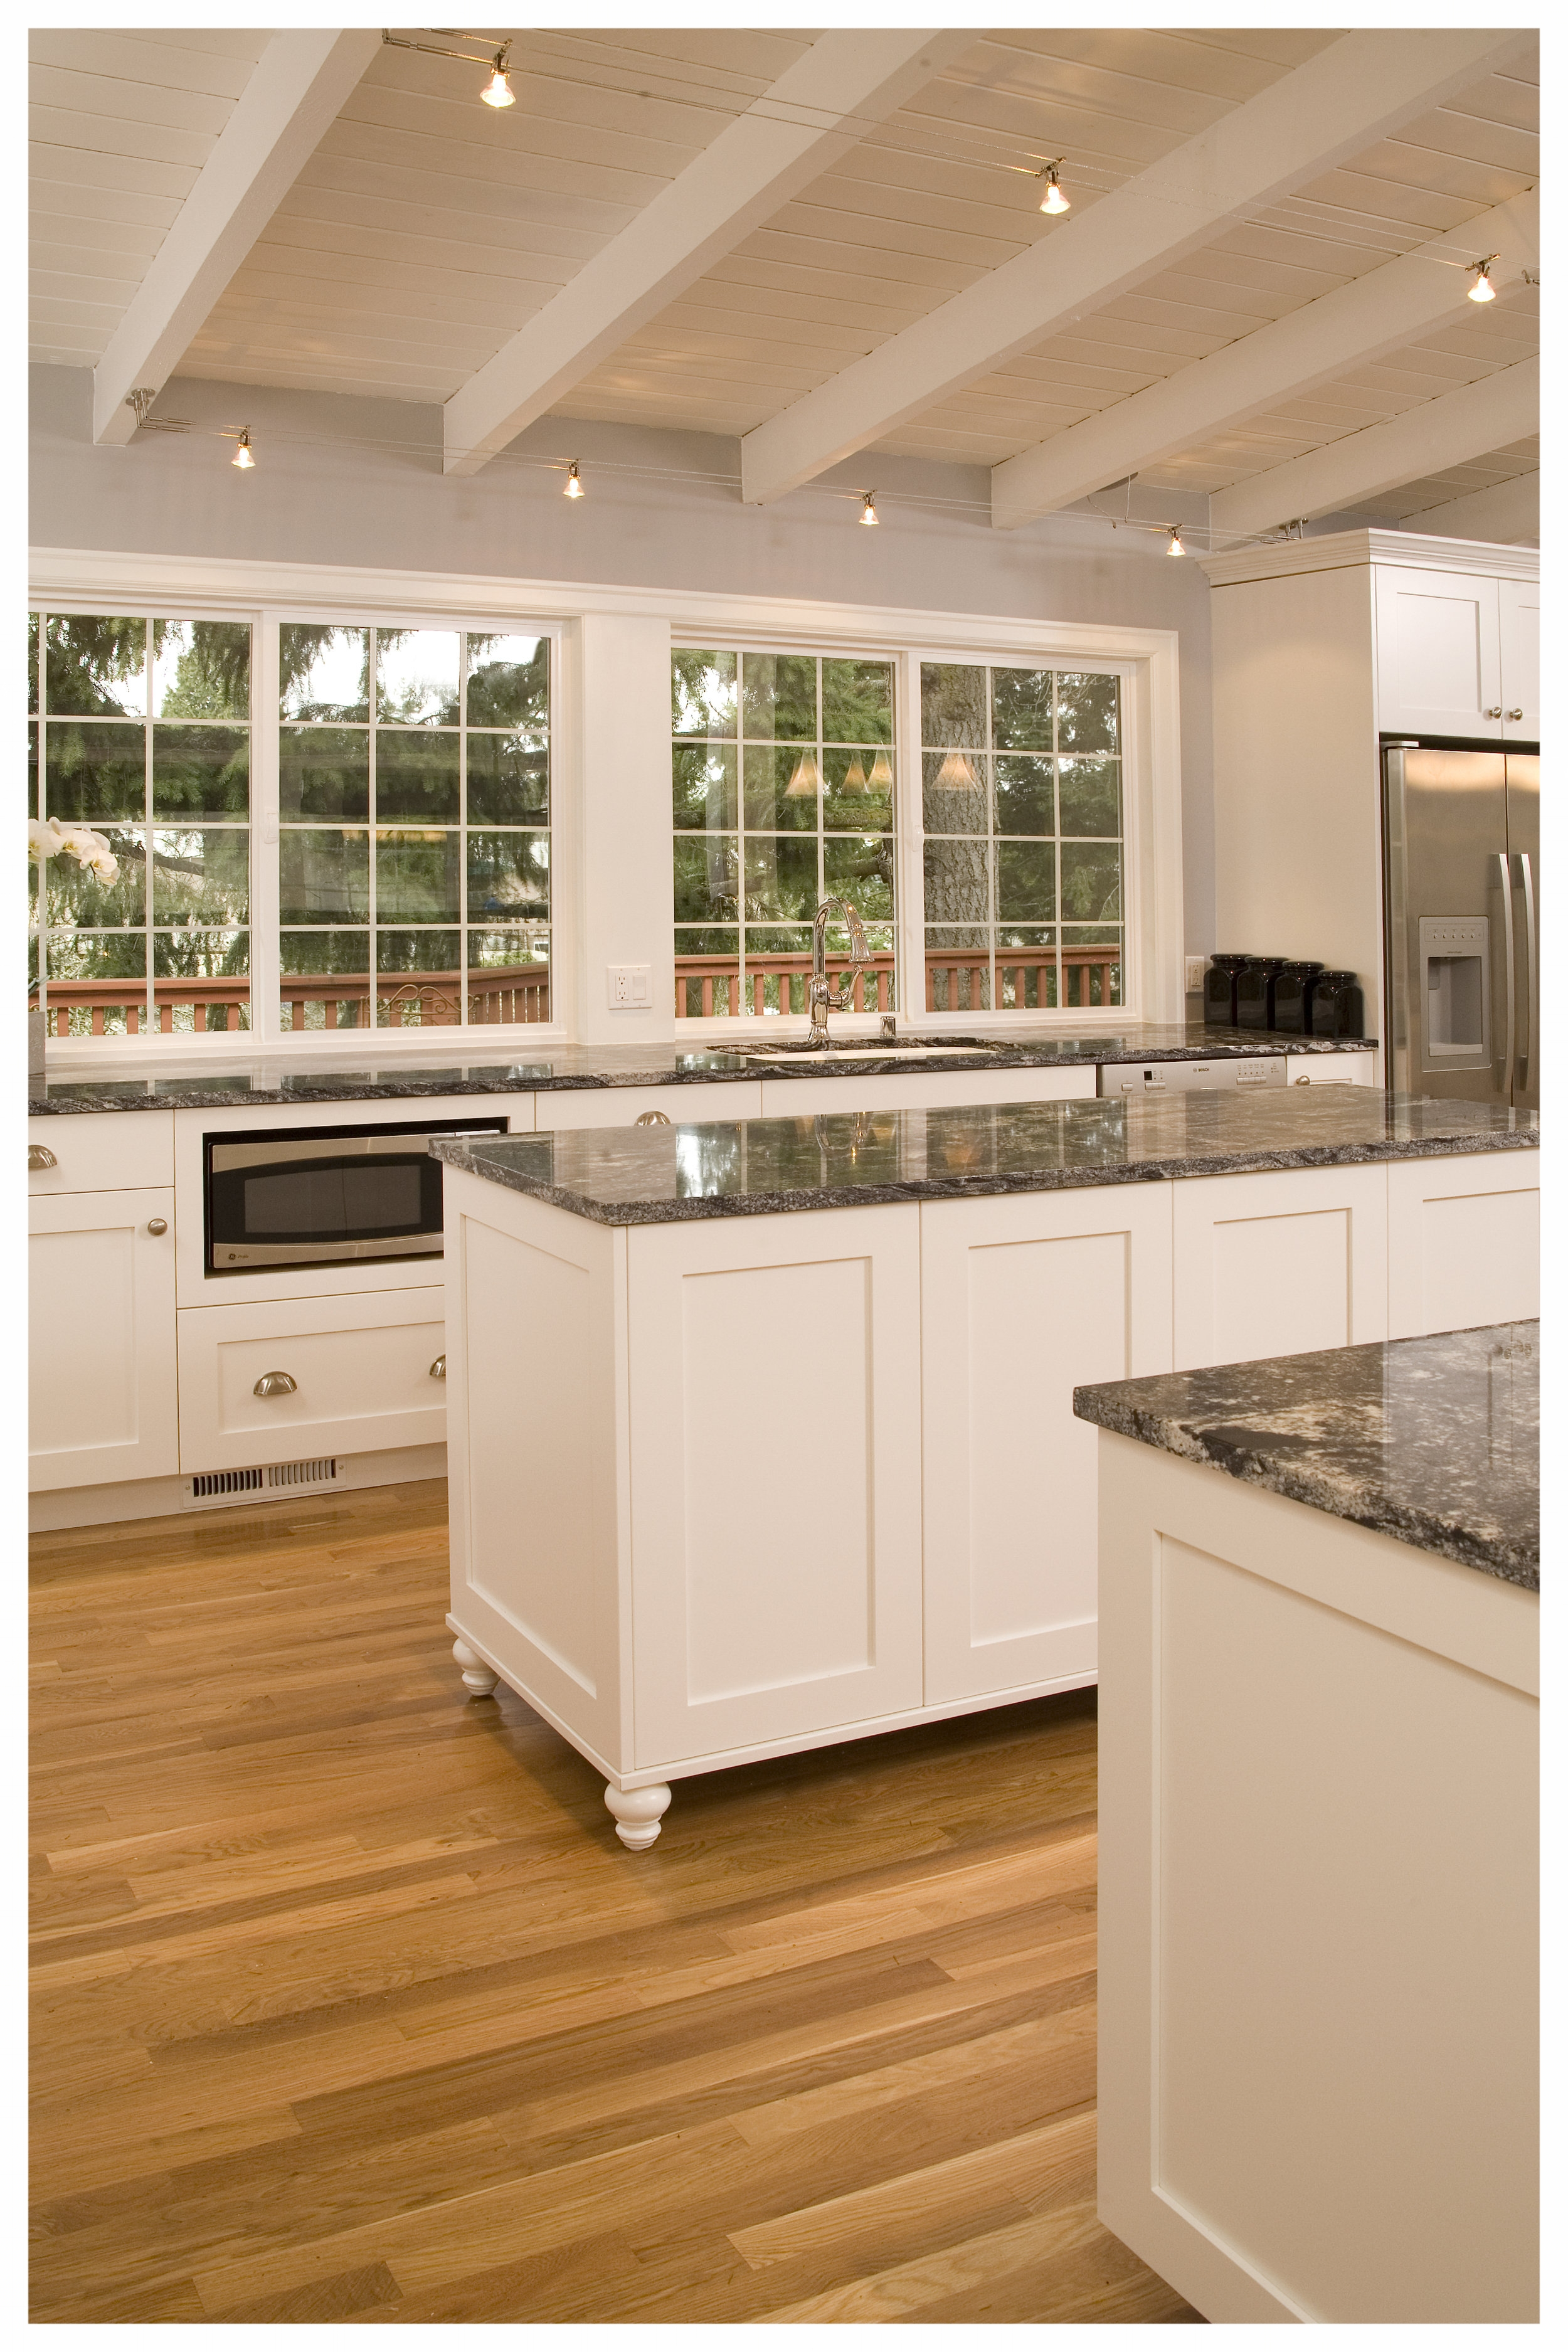 Bellevue Newport Hills Transitional Kitchen 3.jpg